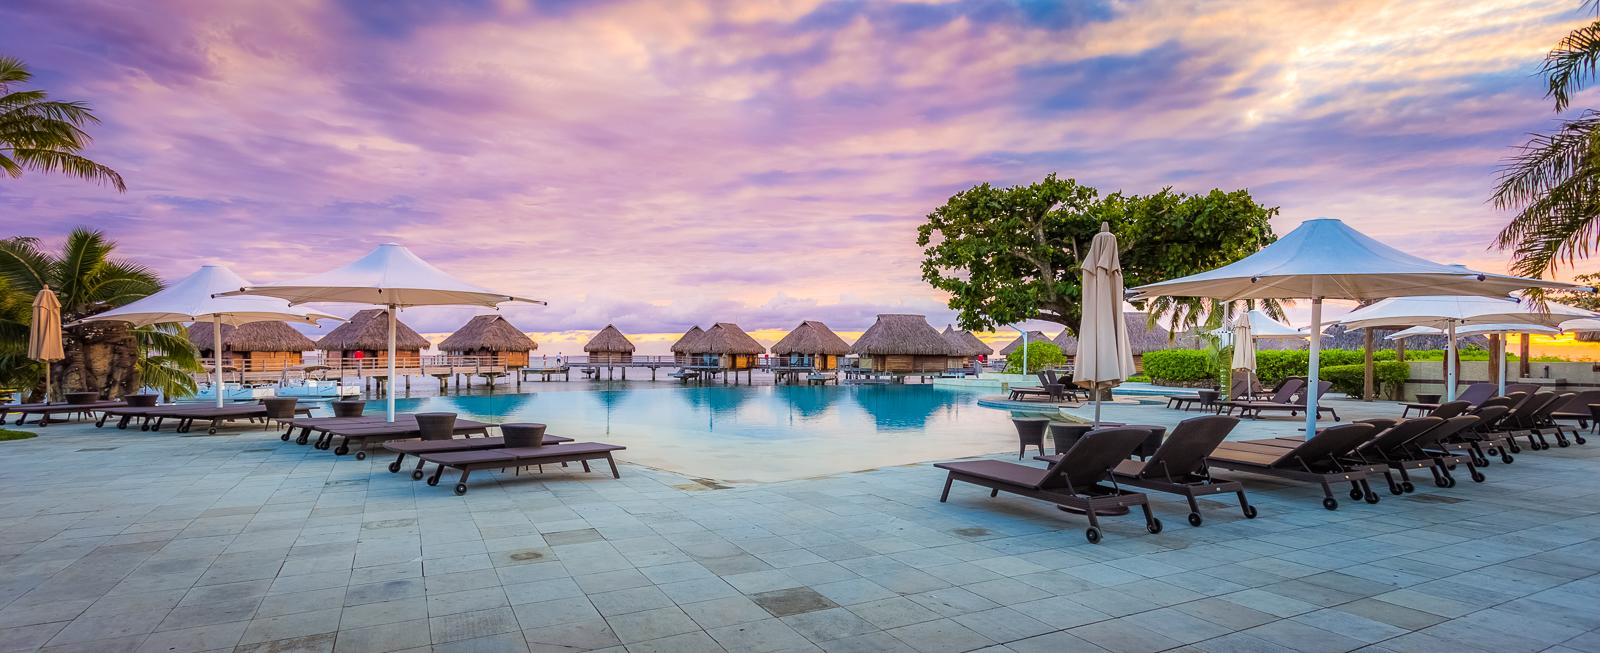 https://tahititourisme.com.au/wp-content/uploads/2018/03/Moorea-Pearl-Resort-®-Charles-Veronese-30.jpg